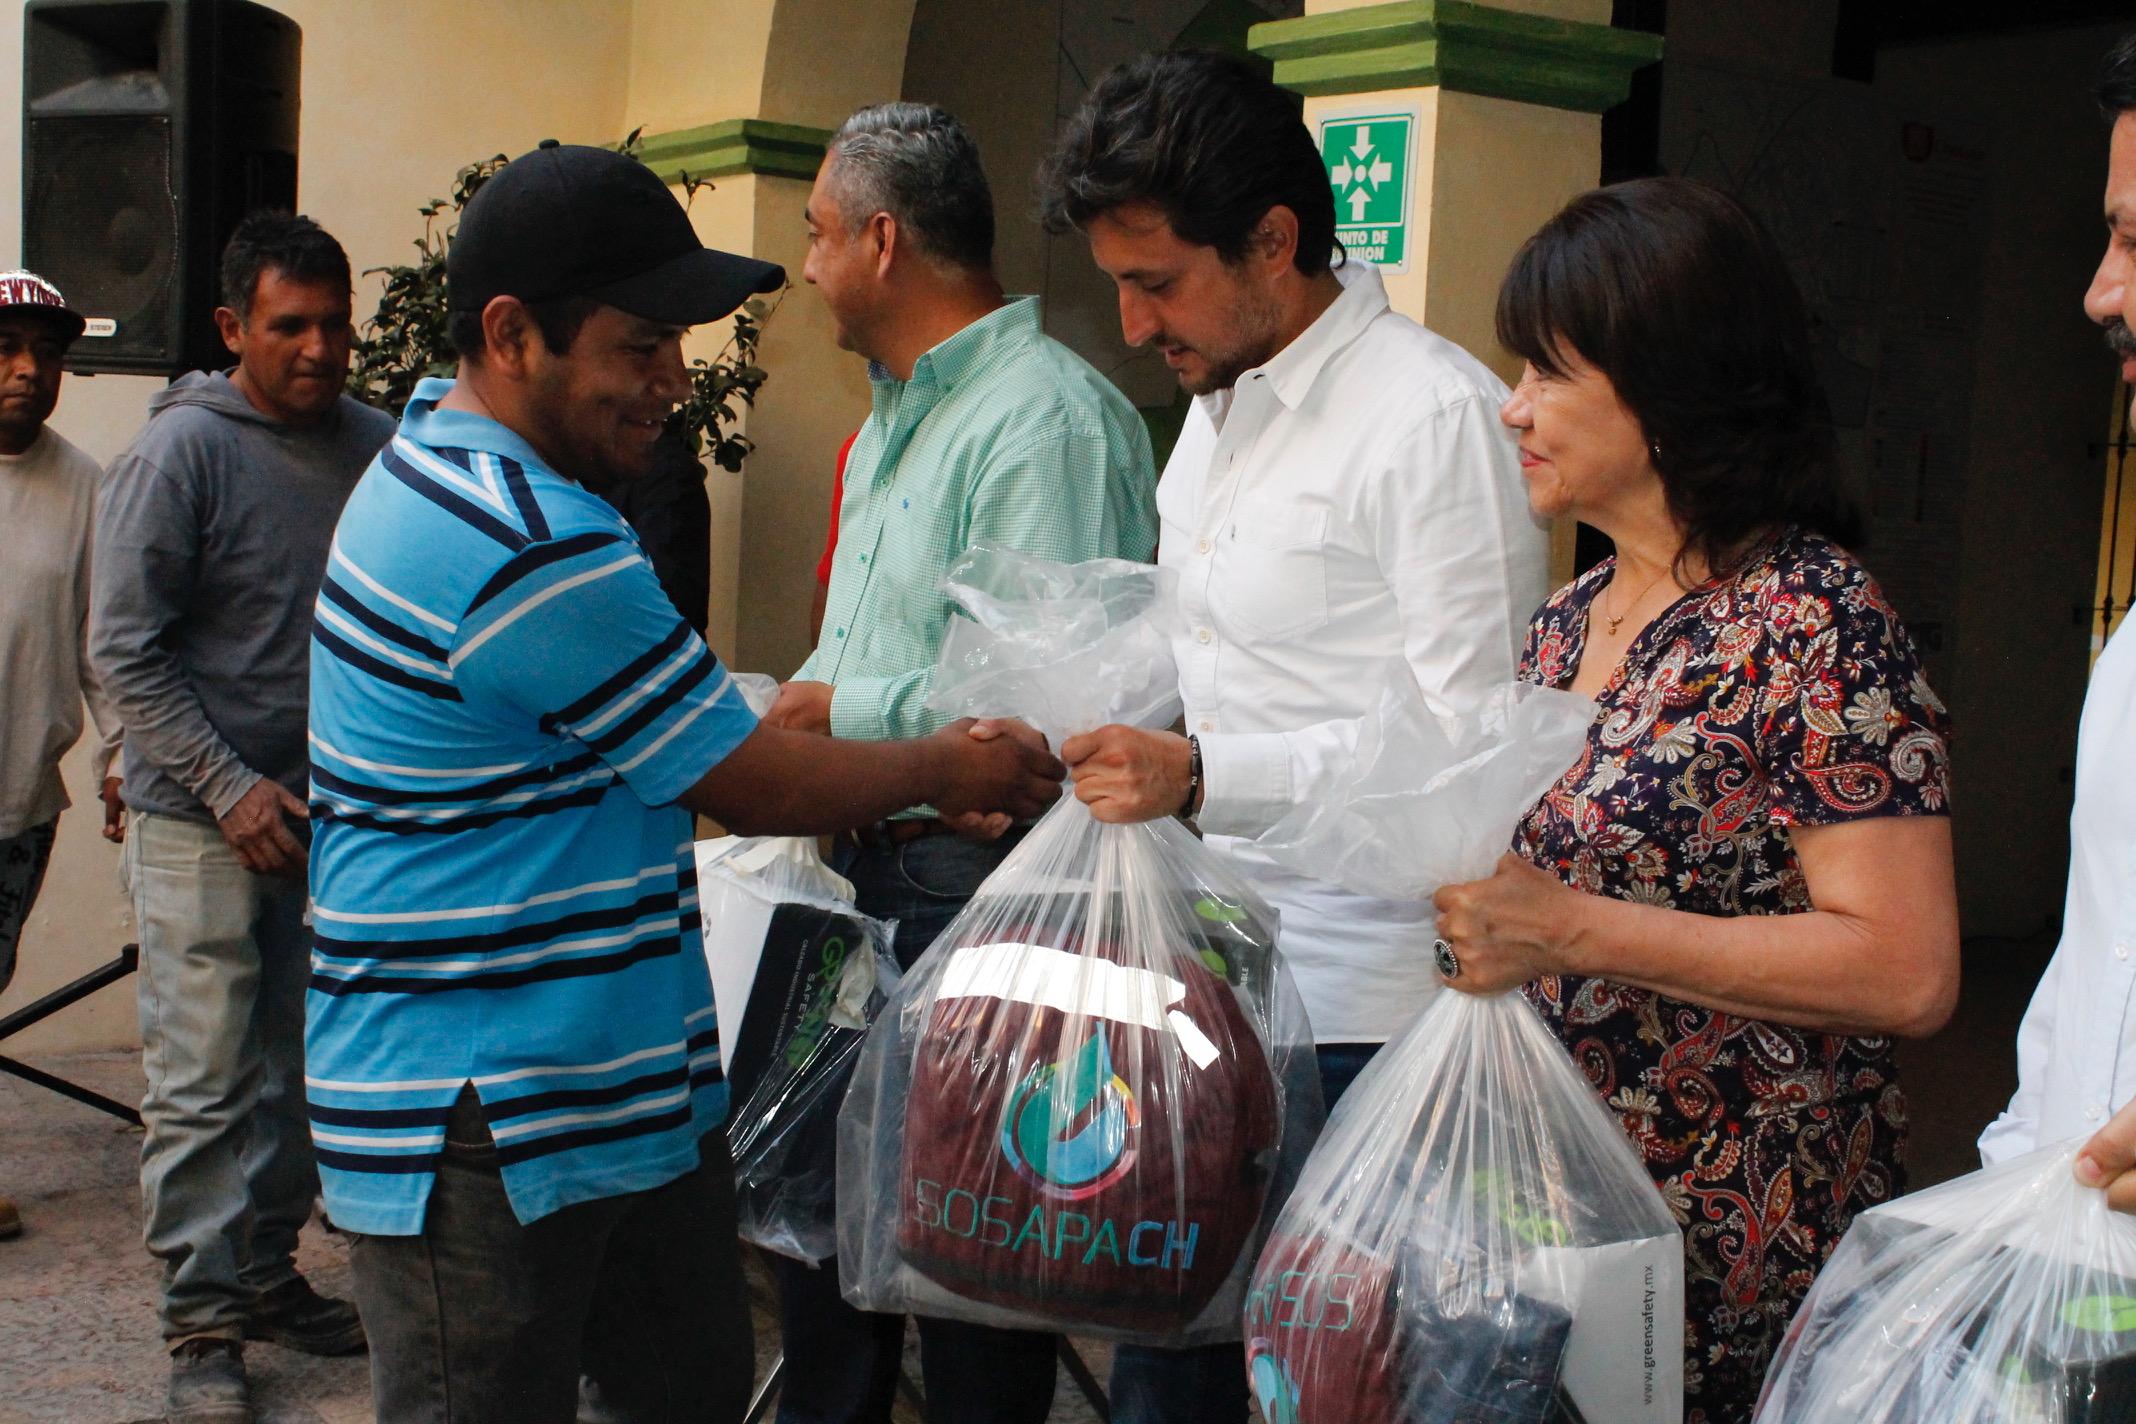 Entregó edil de San Pedro Cholula uniformes a personal de SOSAPACH.